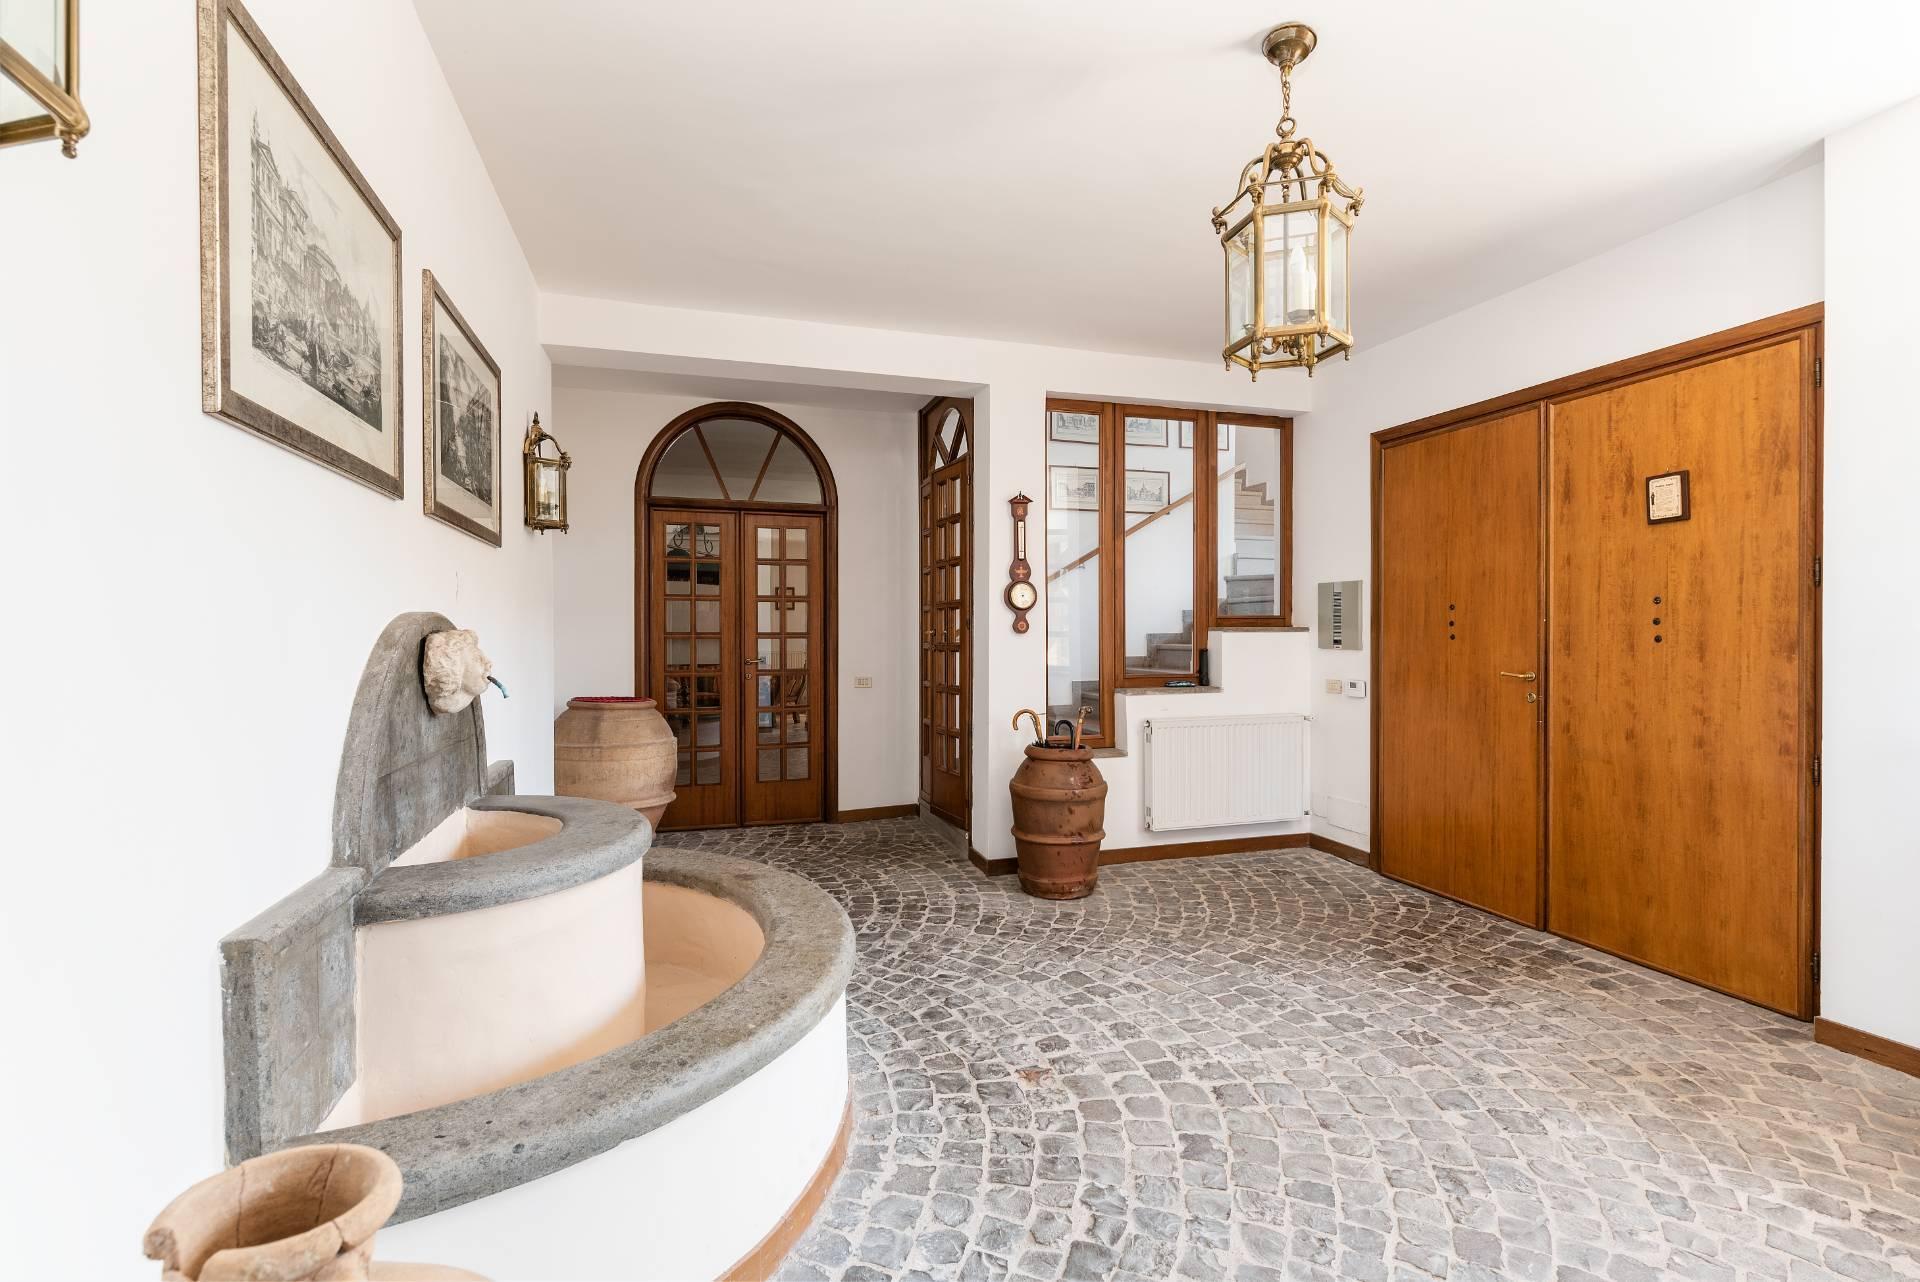 Villa in Vendita a Ariccia: 5 locali, 583 mq - Foto 23